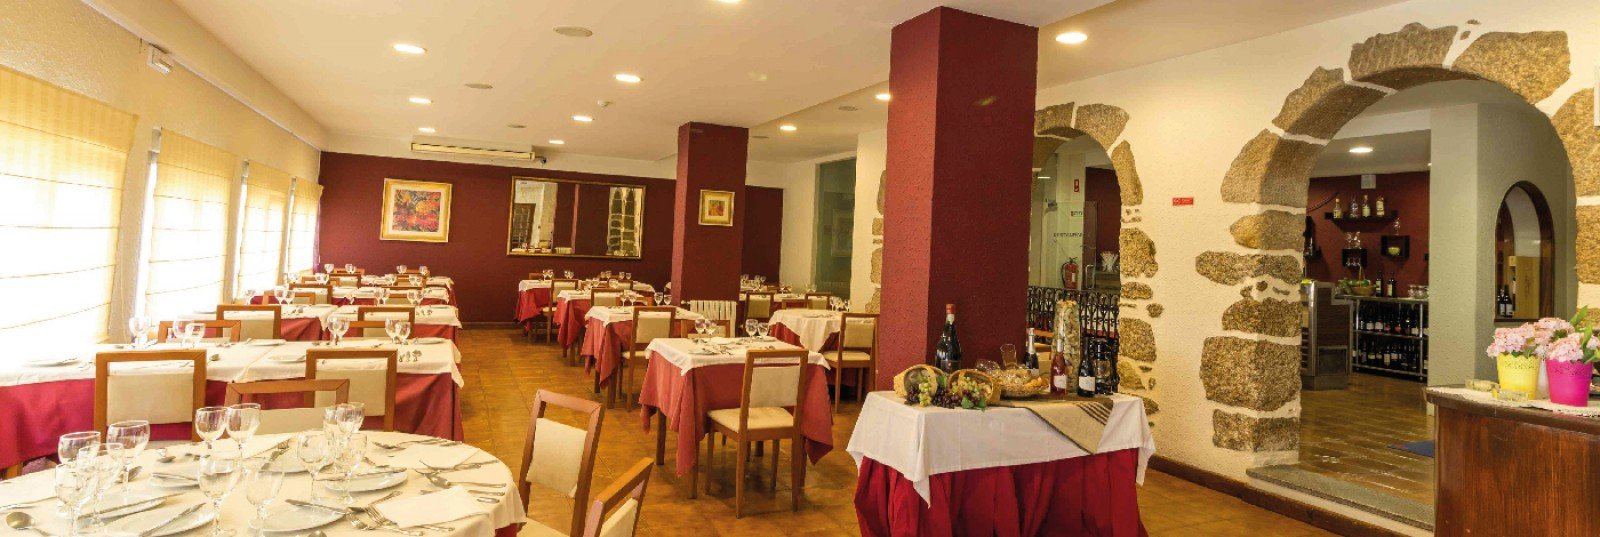 Hotel Eurosol Gouveia - restaurant